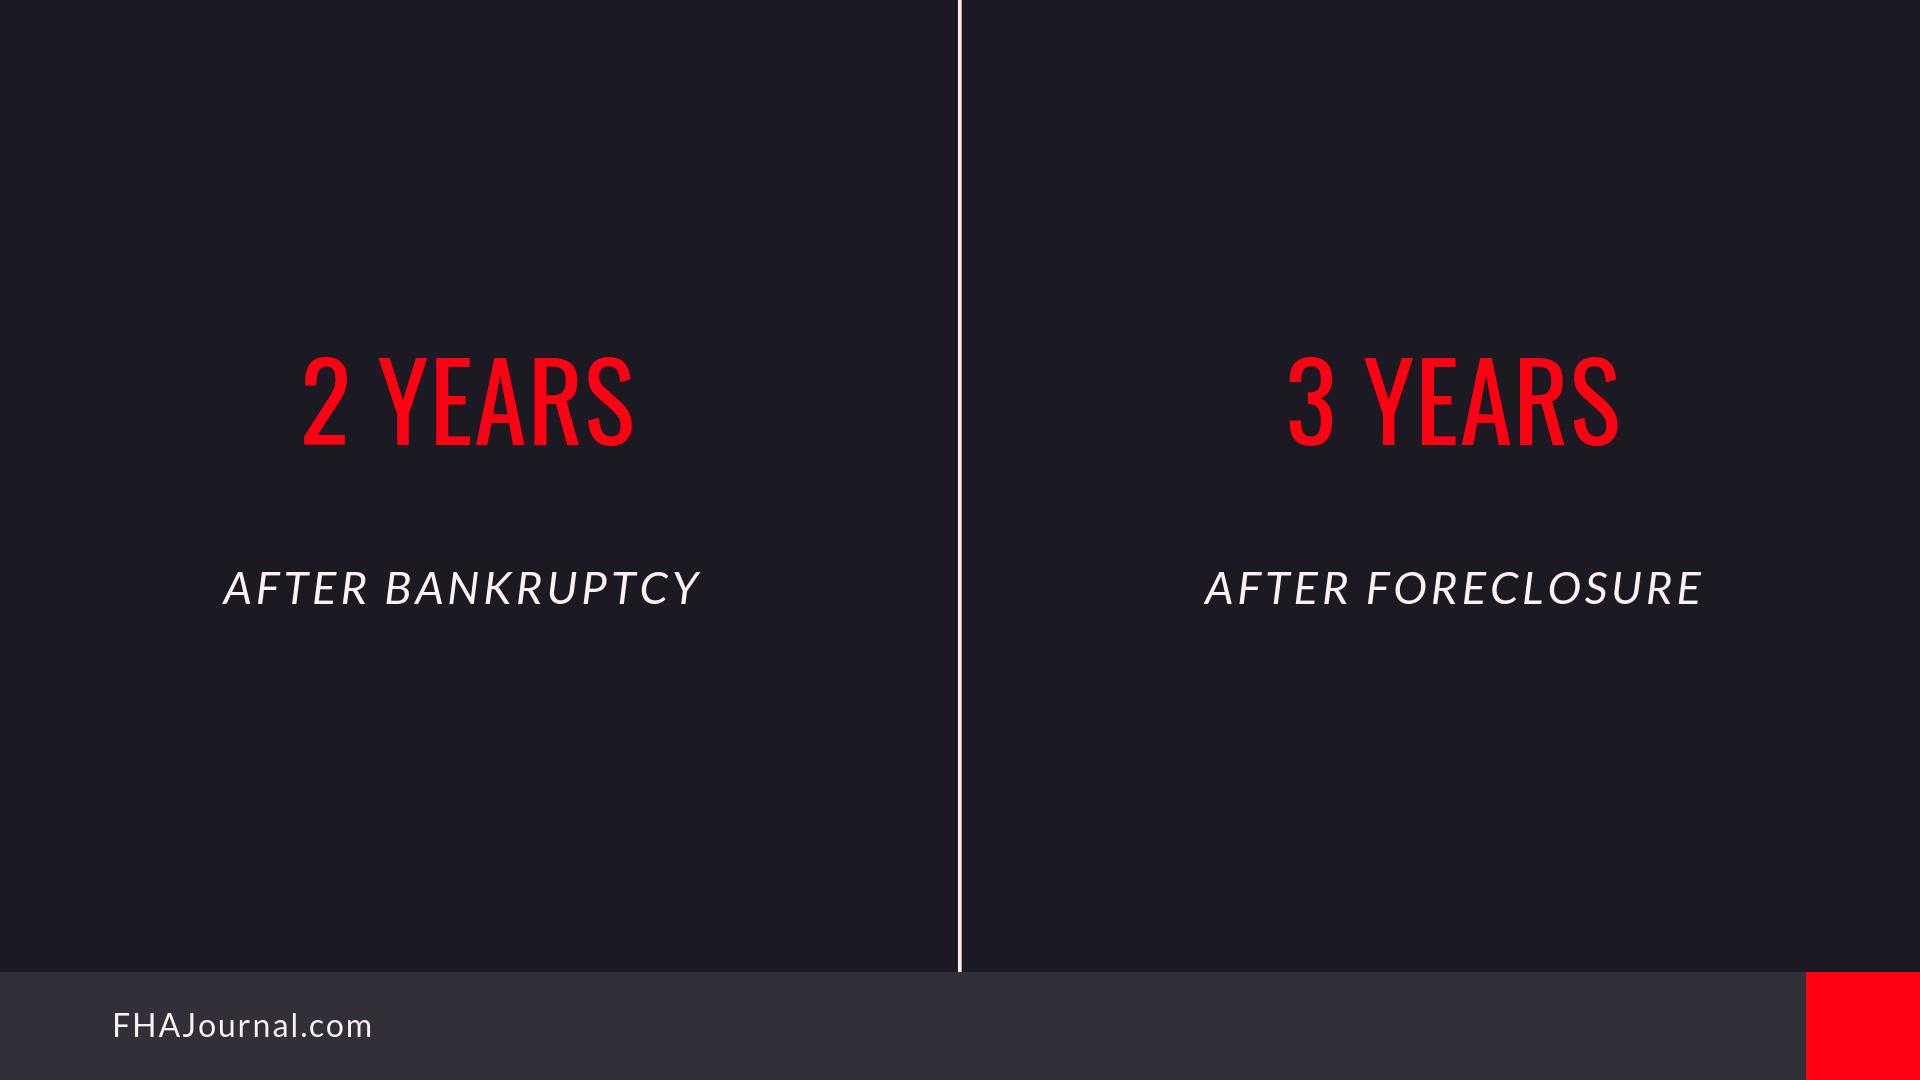 Bankruptcy-Foreclosure-Timeline